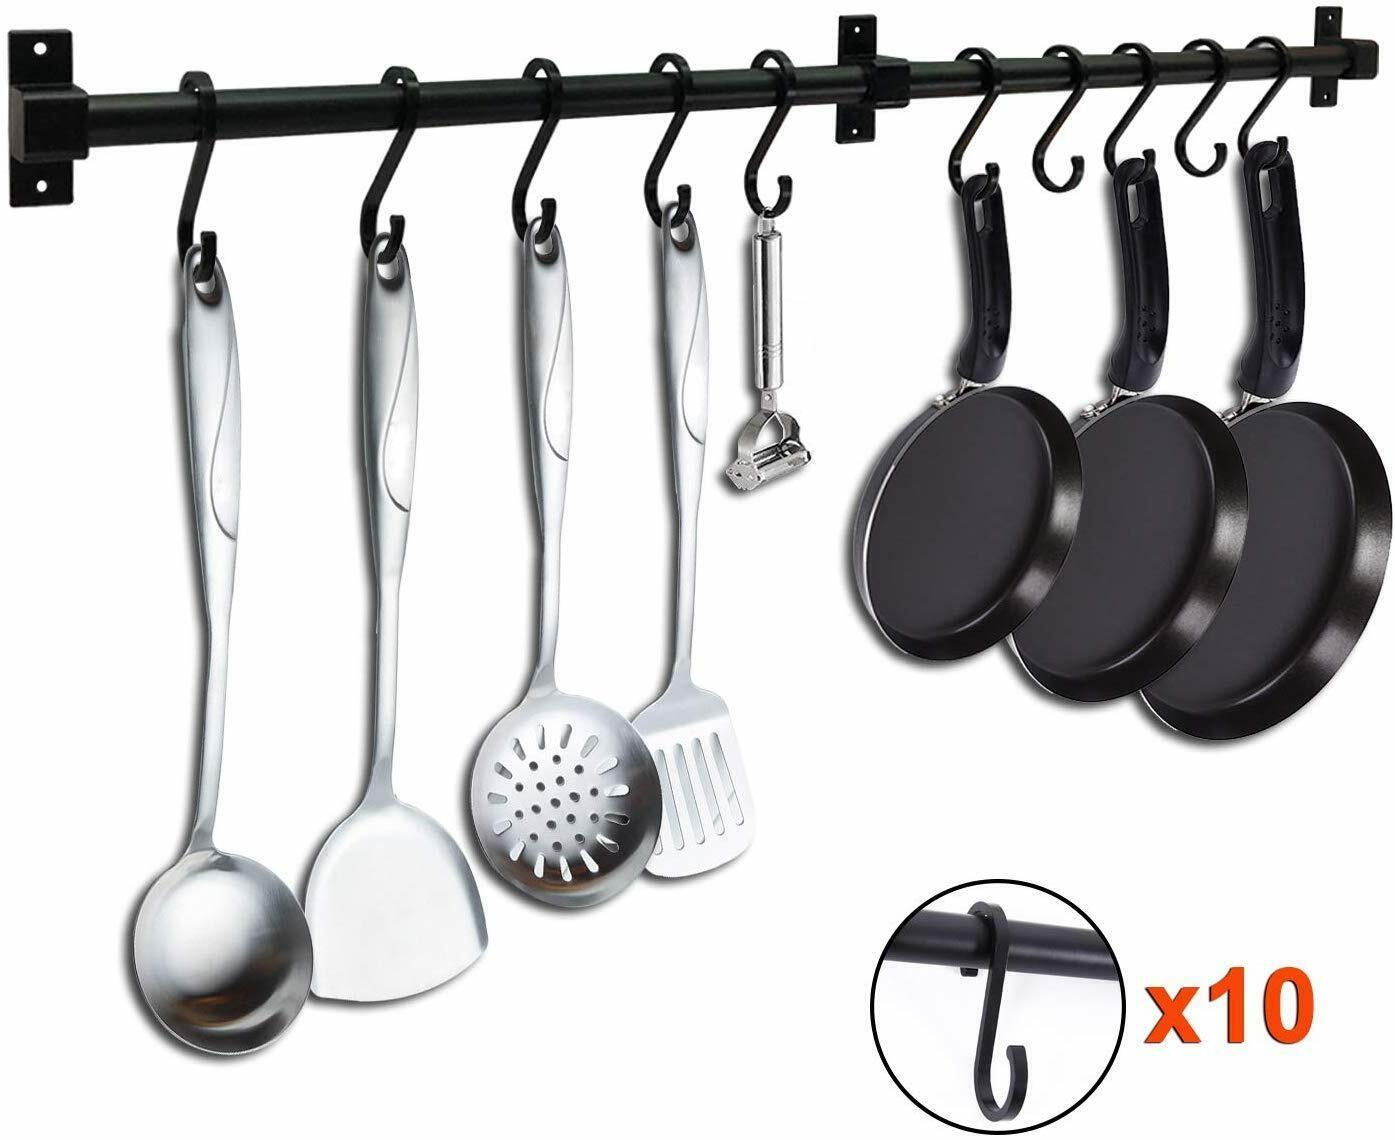 Wall Mount Pot Pan Hanging Rack Kitchen Cookware Storage Organizer Holder Hook For Sale Online Ebay